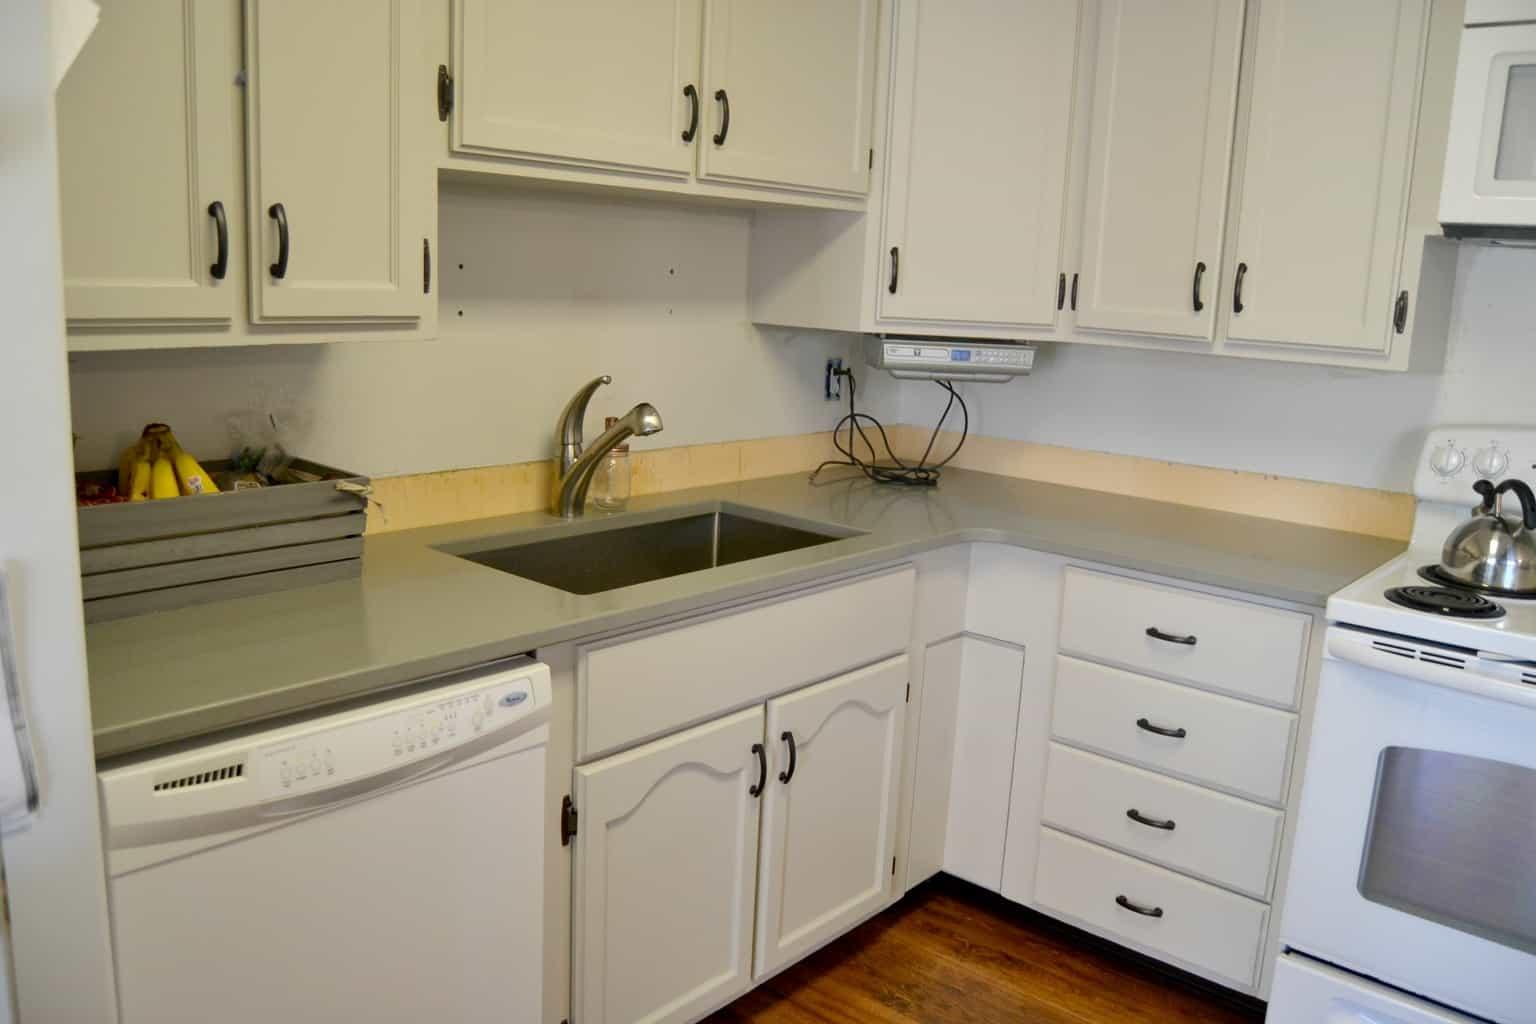 kitchen makeover quartz countertops quartz kitchen countertops Pin this MyCreativeDays com Kitchen Makeover Quartz Countertops